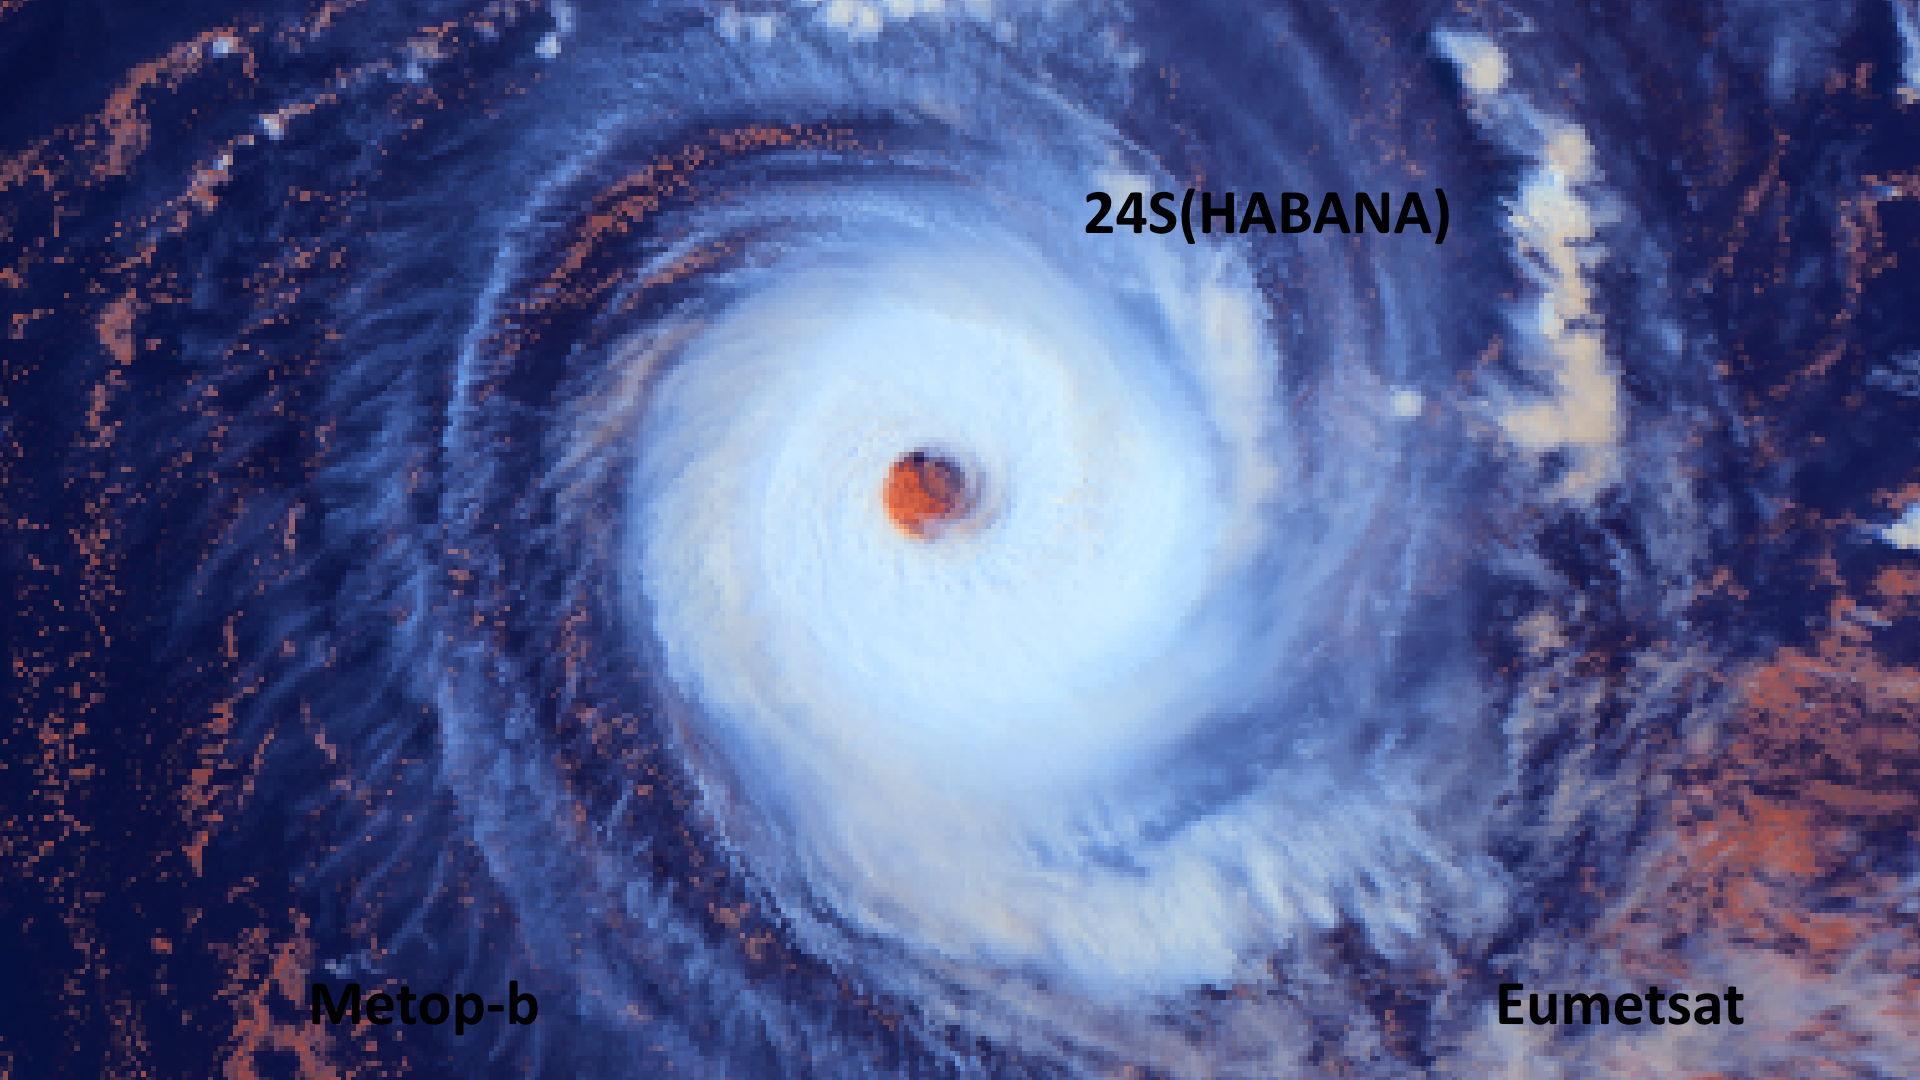 24S(HABANA). 12/0428UTC. METOP-B. Eumetsat. PH.